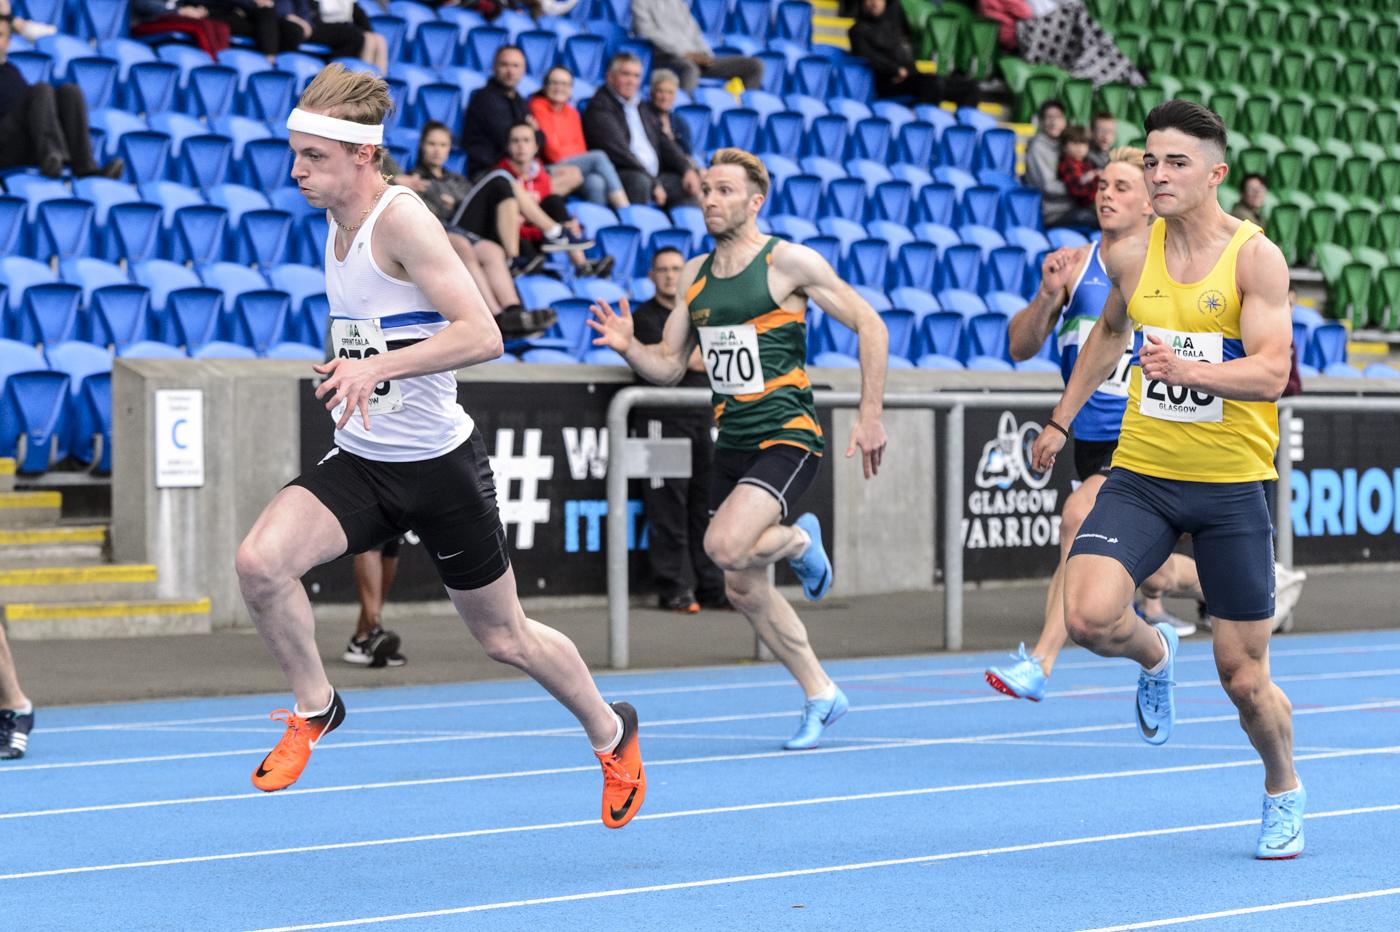 Olsen and others; British Masters 5k; Scots in Boston - Scottish Athletics